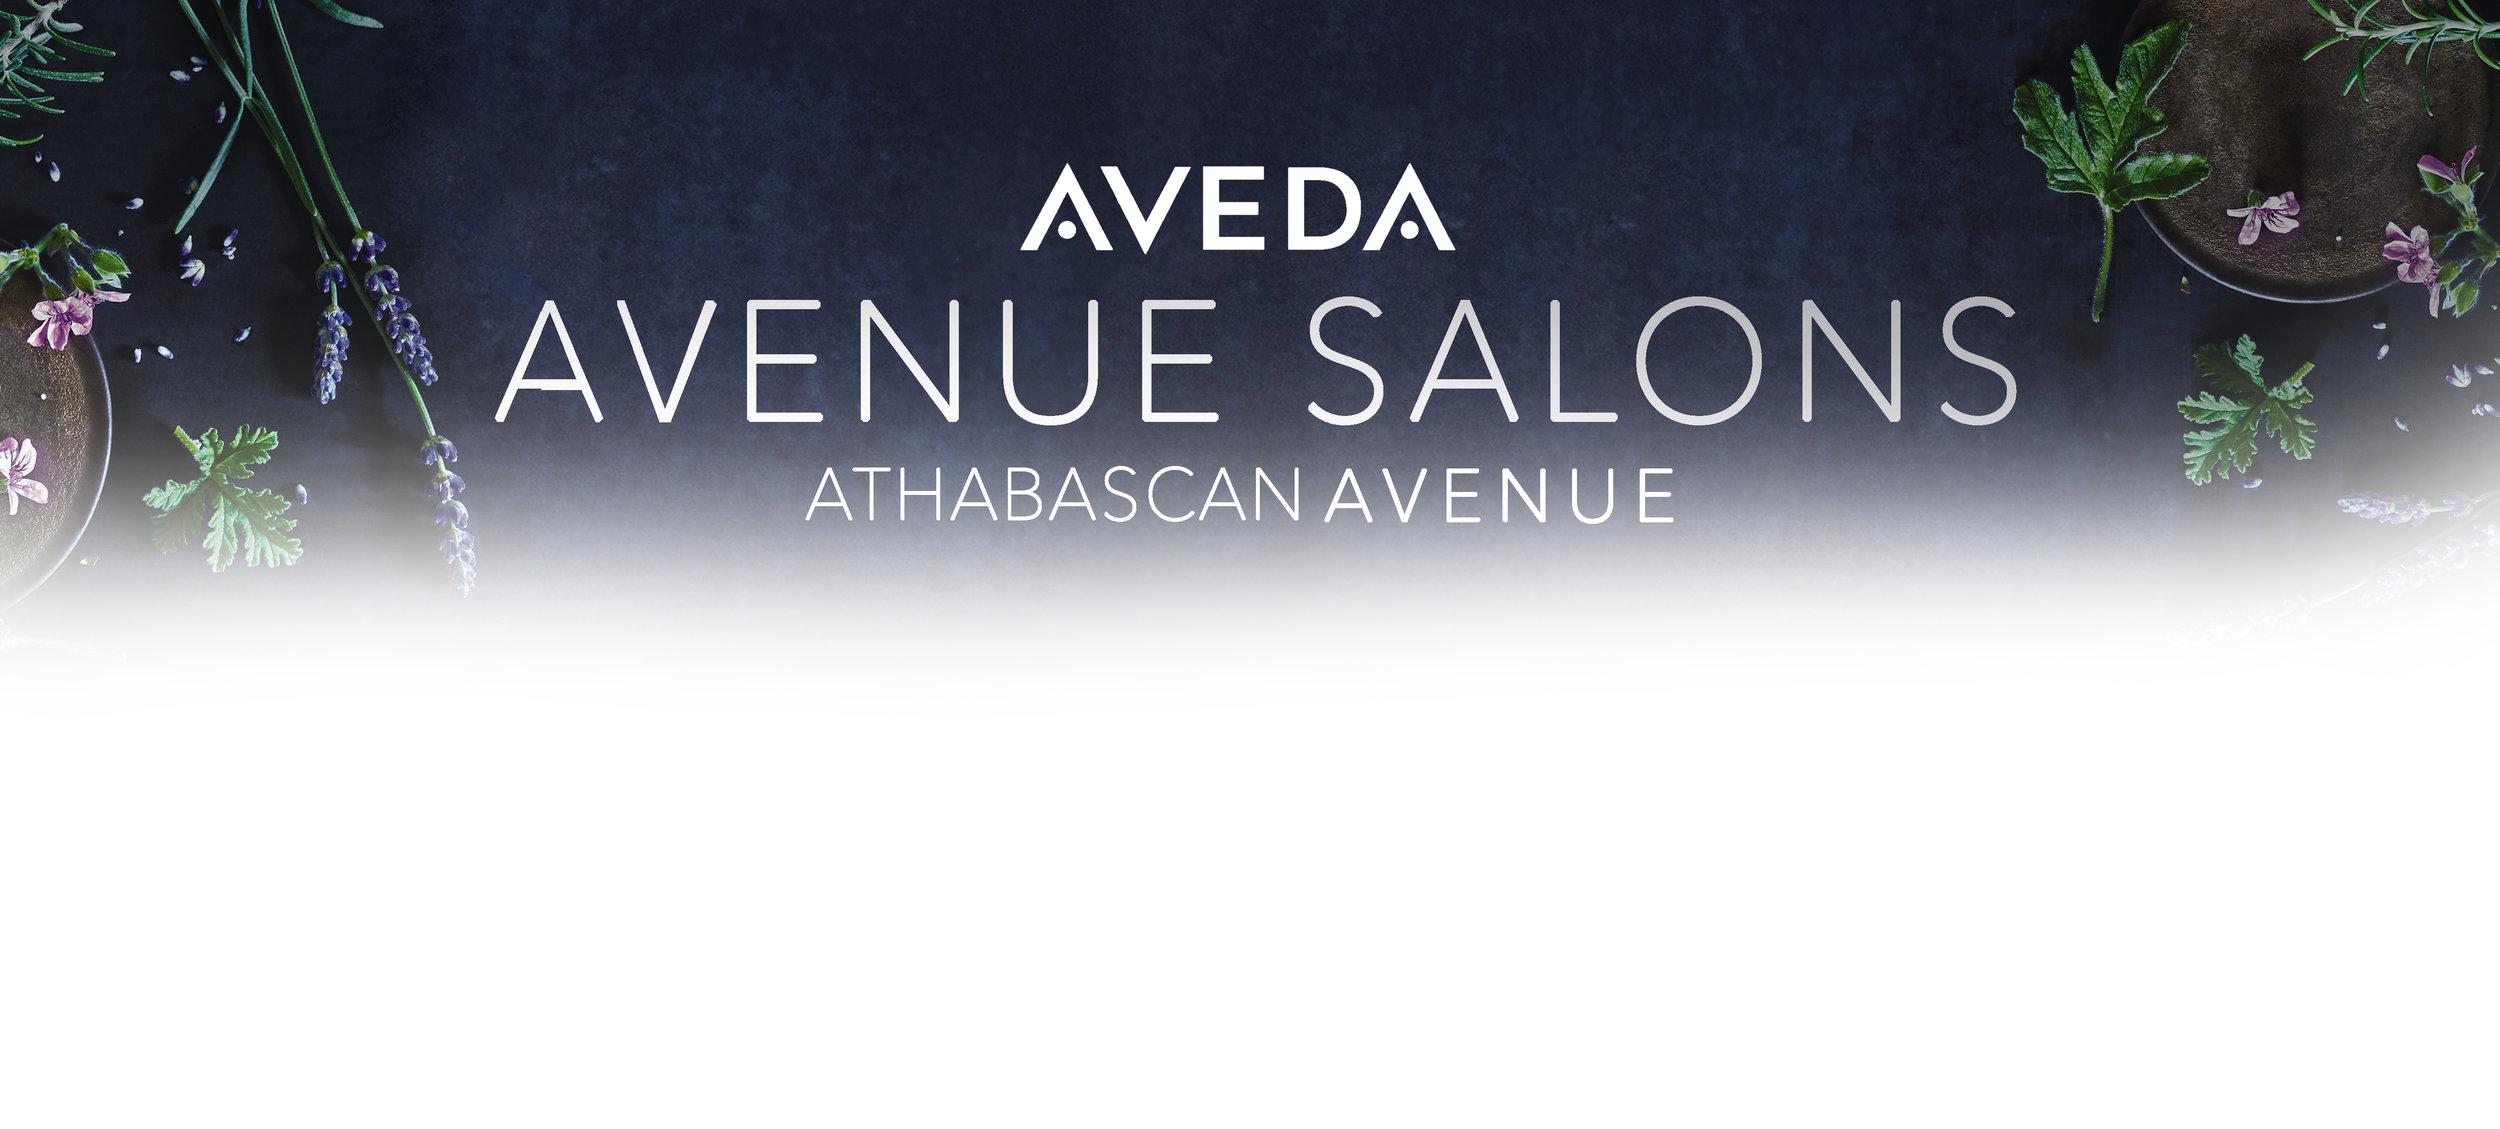 athabascan avenue headder.jpg